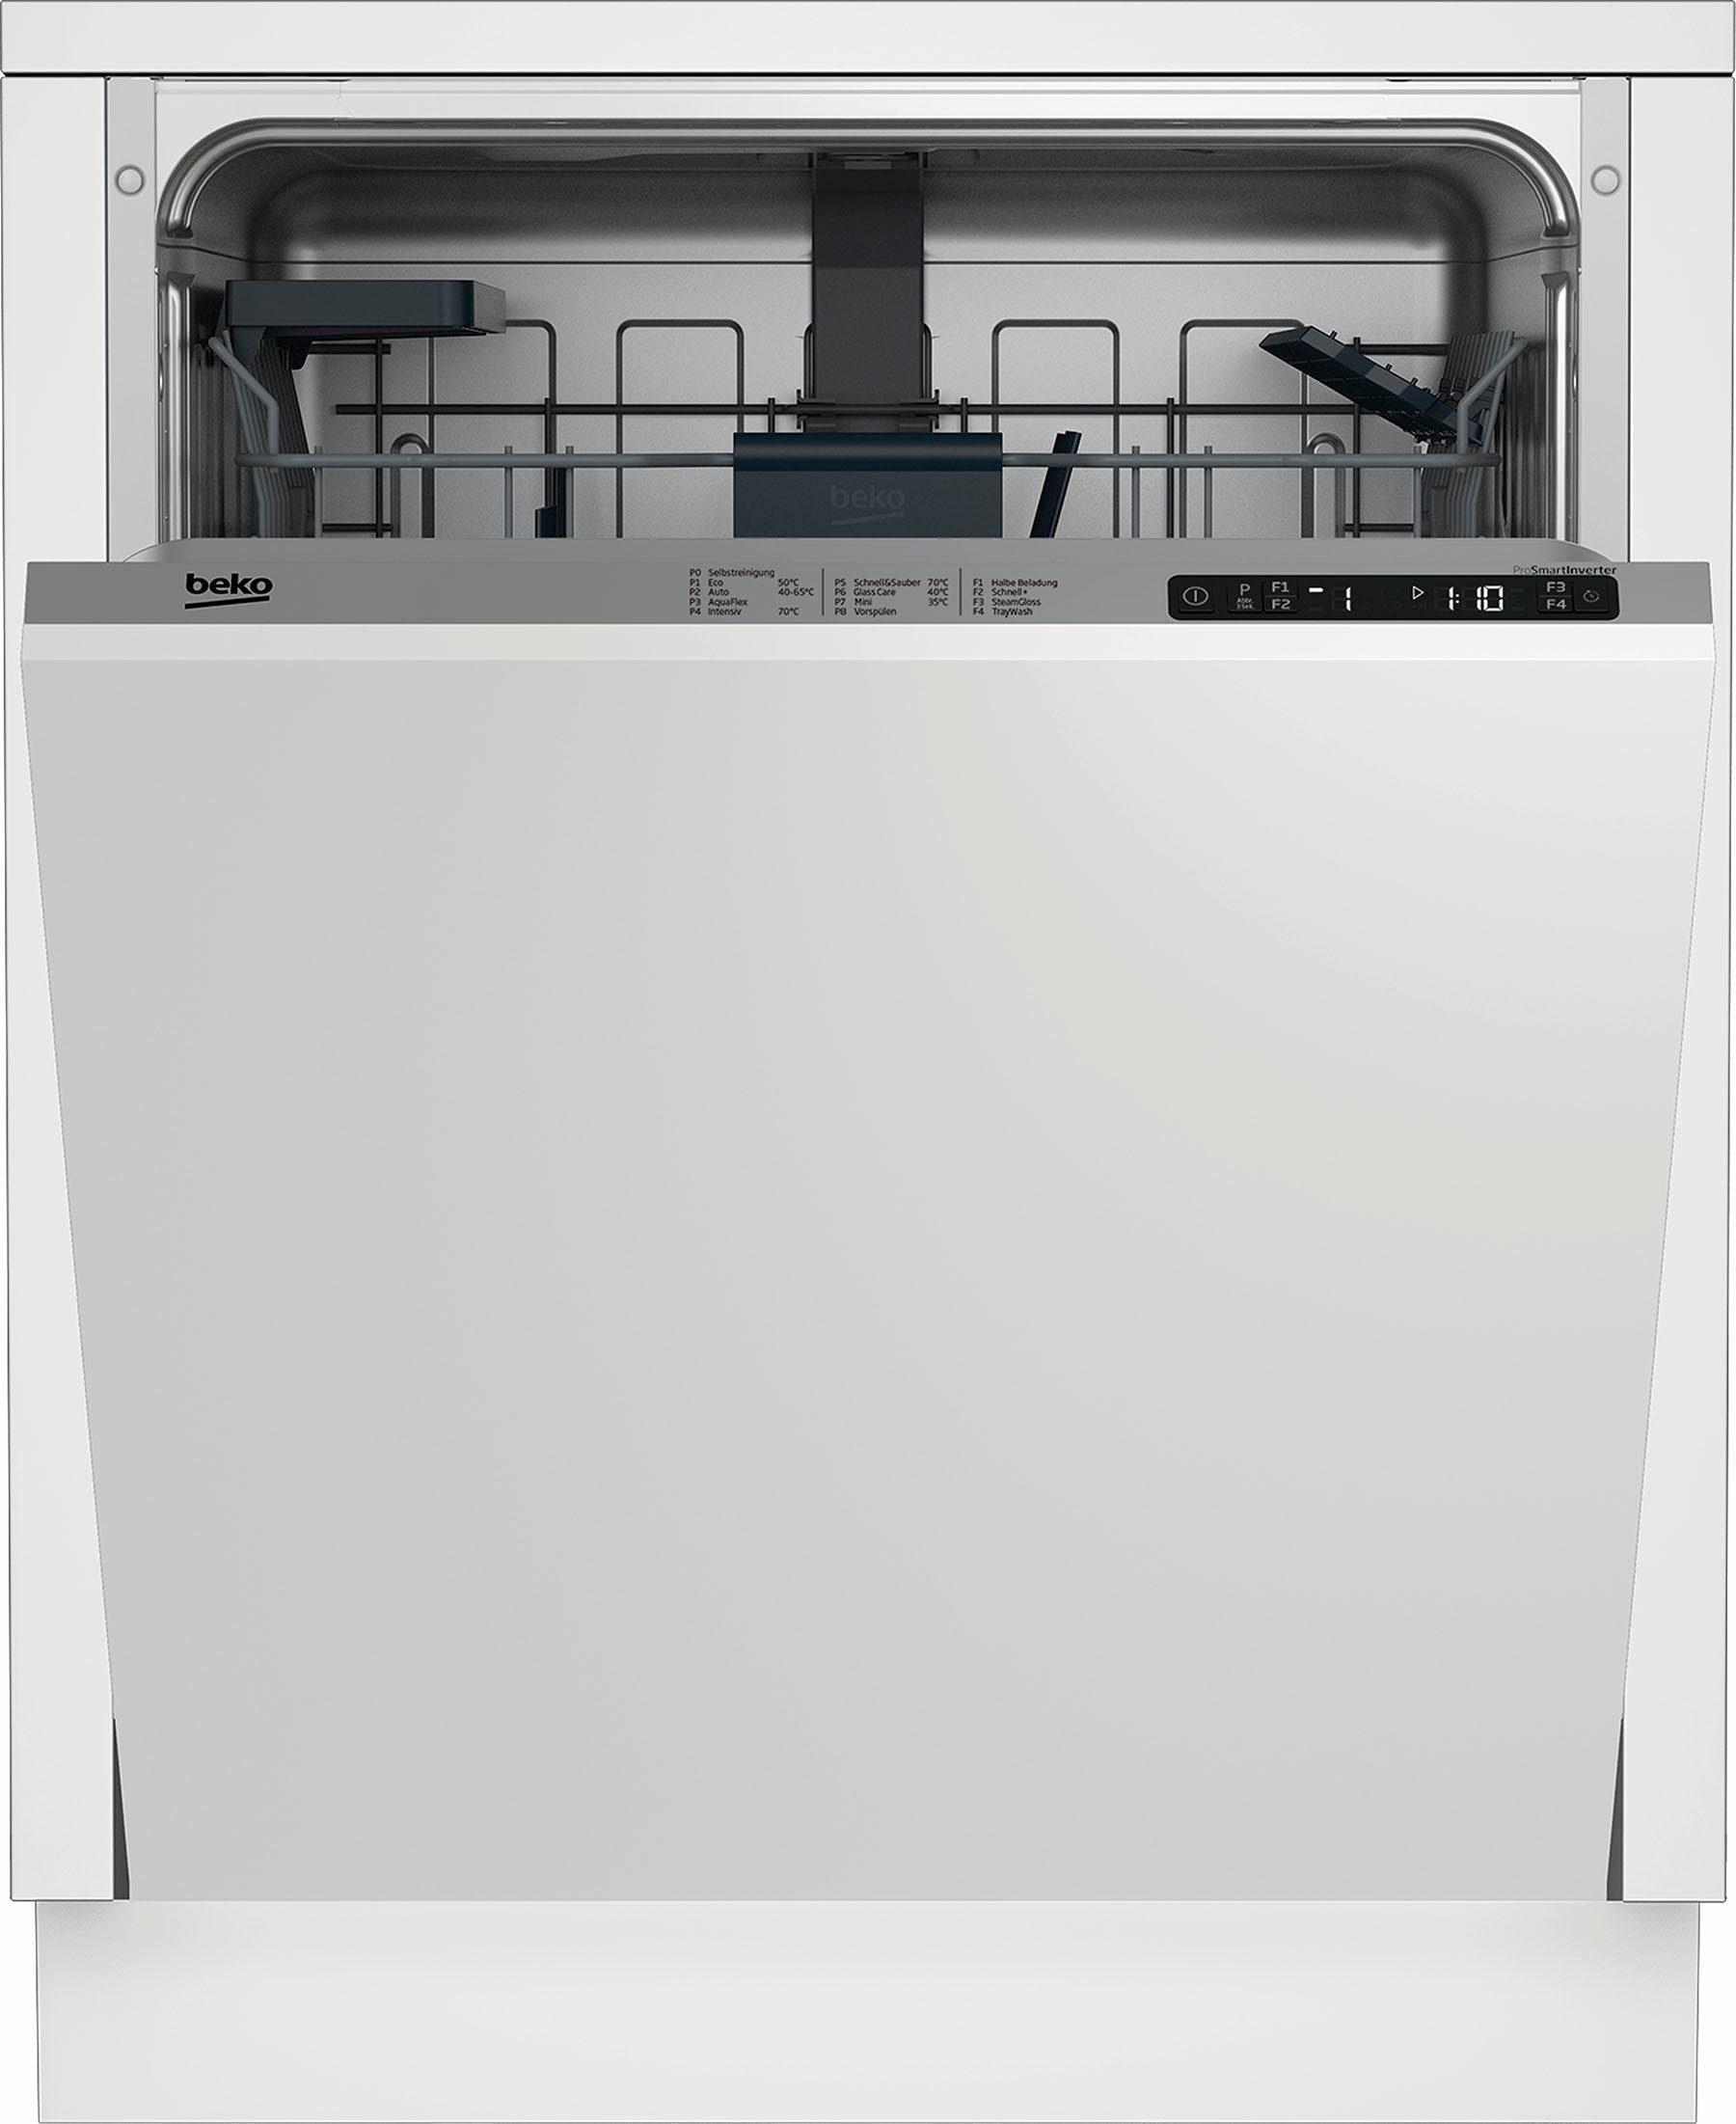 BEKO vollintegrierbarer Geschirrspüler, DIN28O35, 9,5 l, 14 Maßgedecke, Energieeffizienzklasse A+++